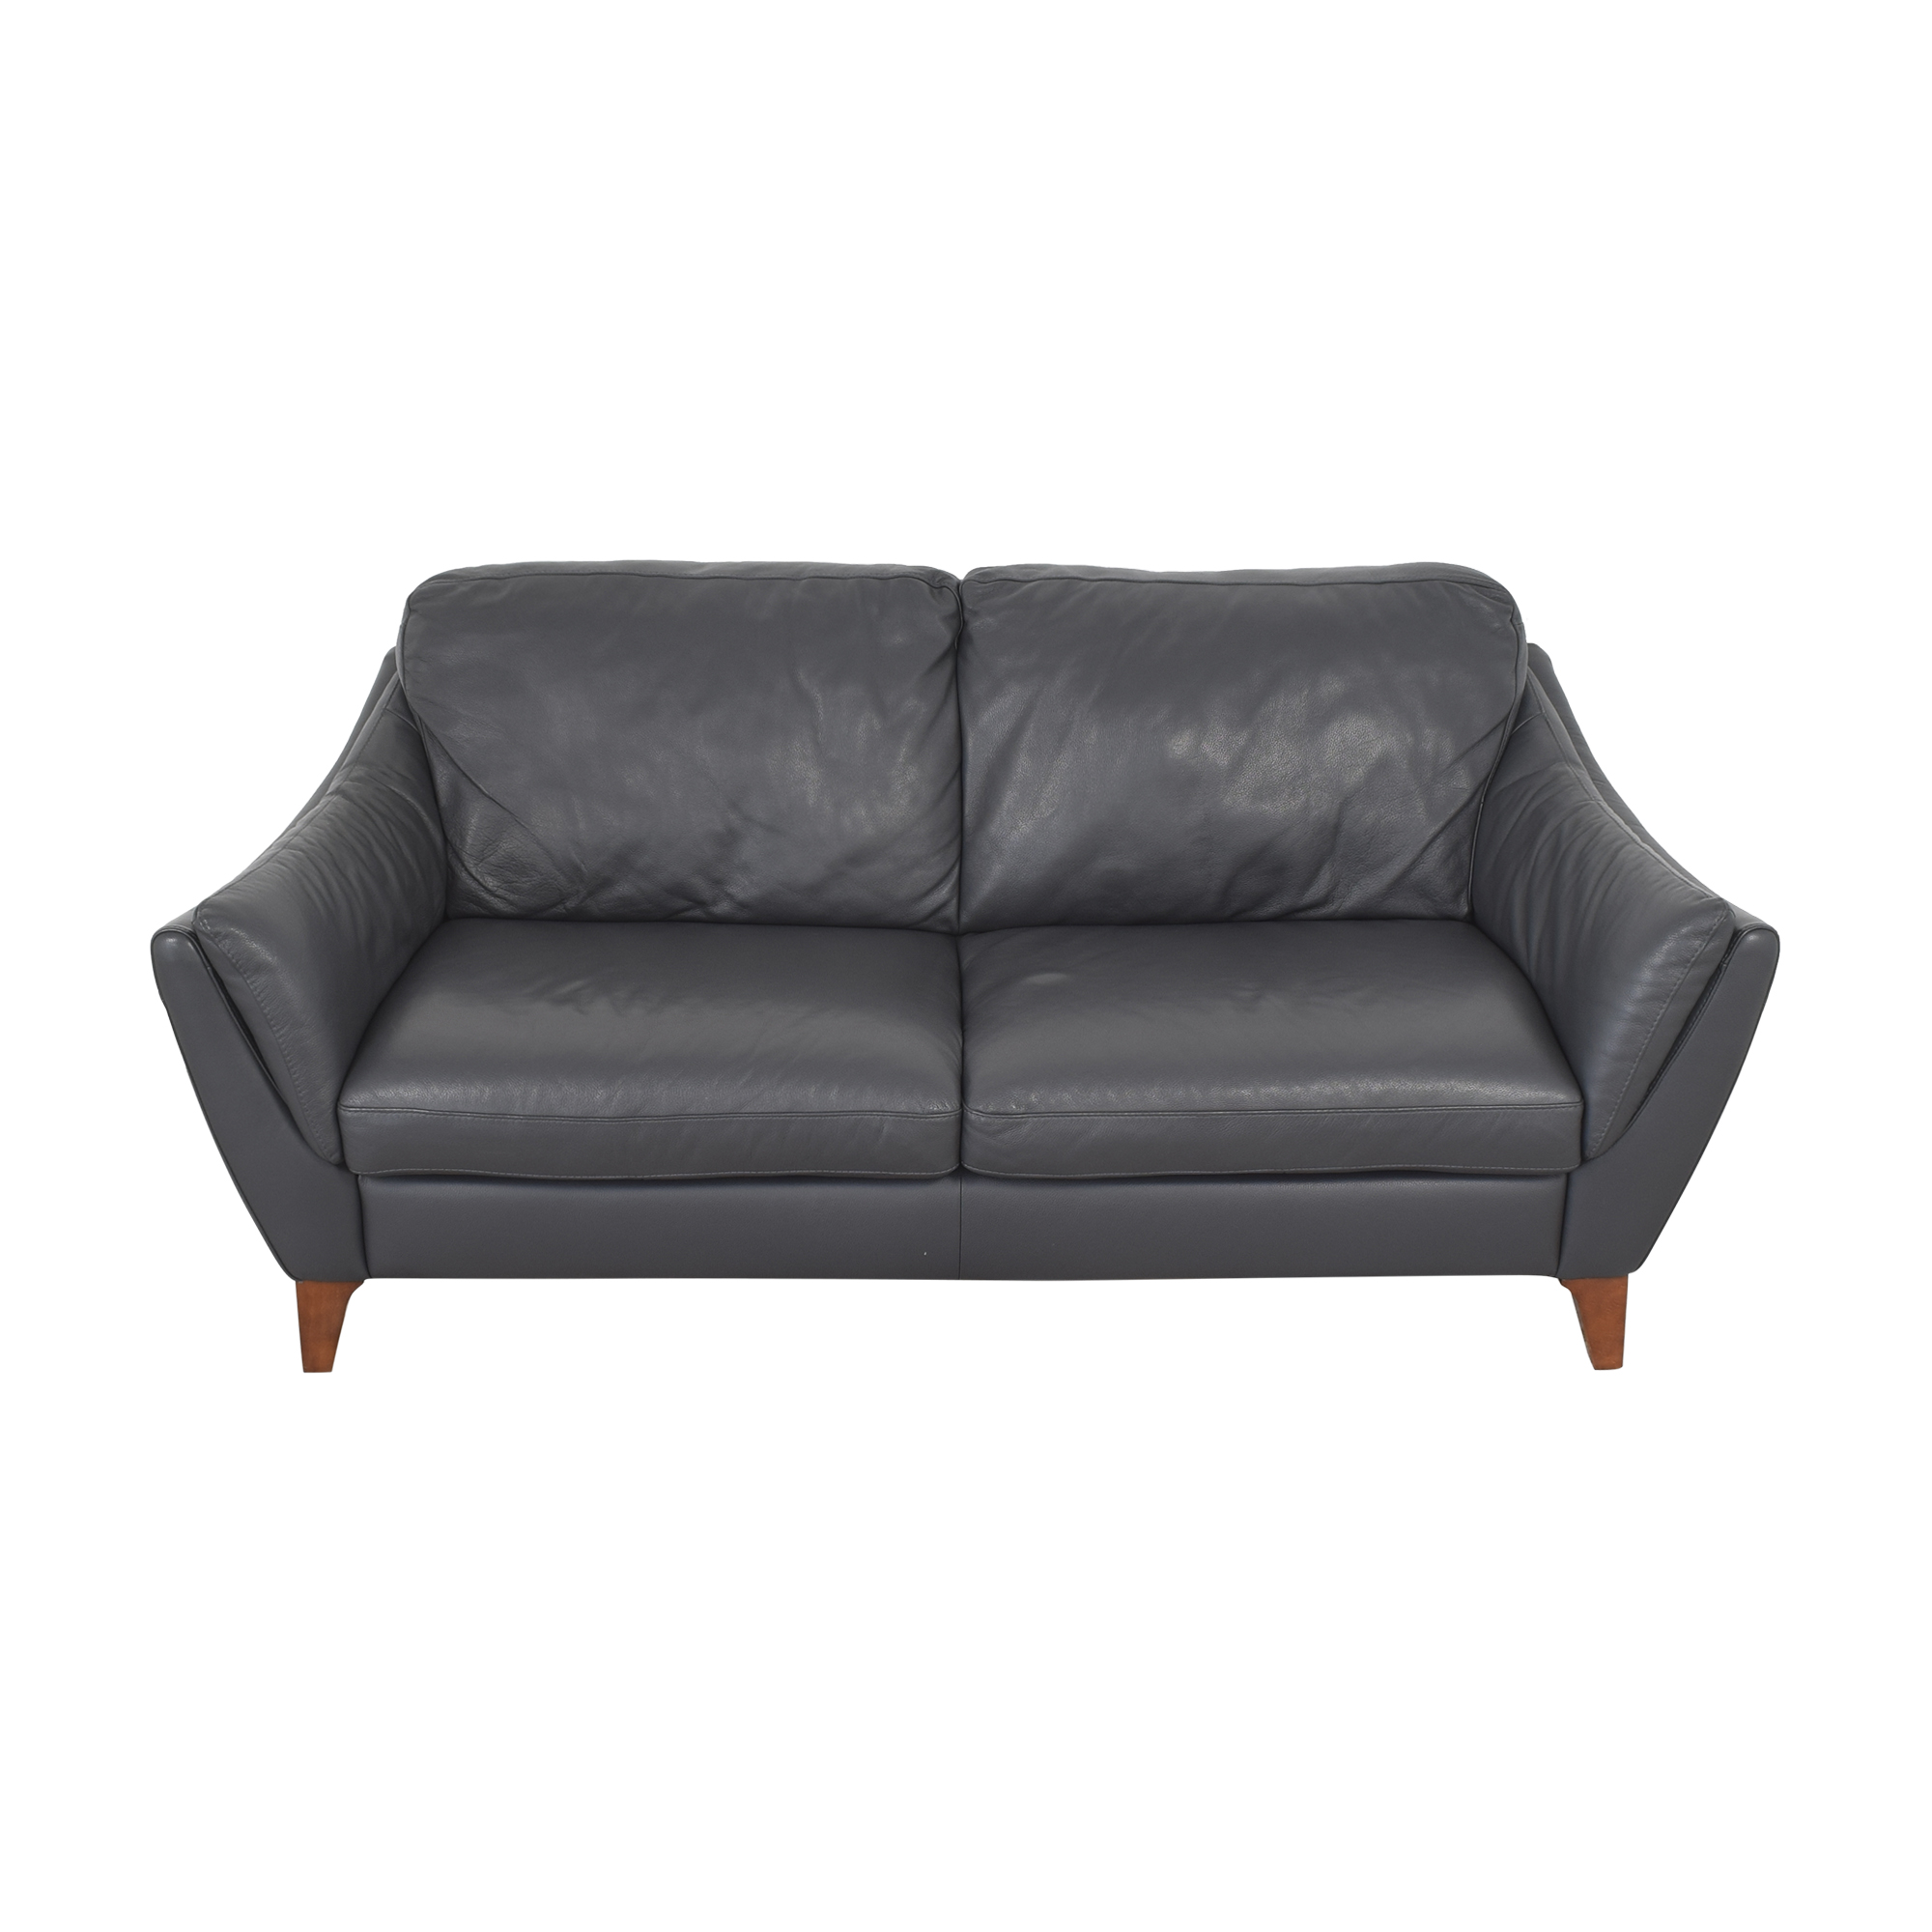 Natuzzi Natuzzi Greccio Two Cushion Sofa ma